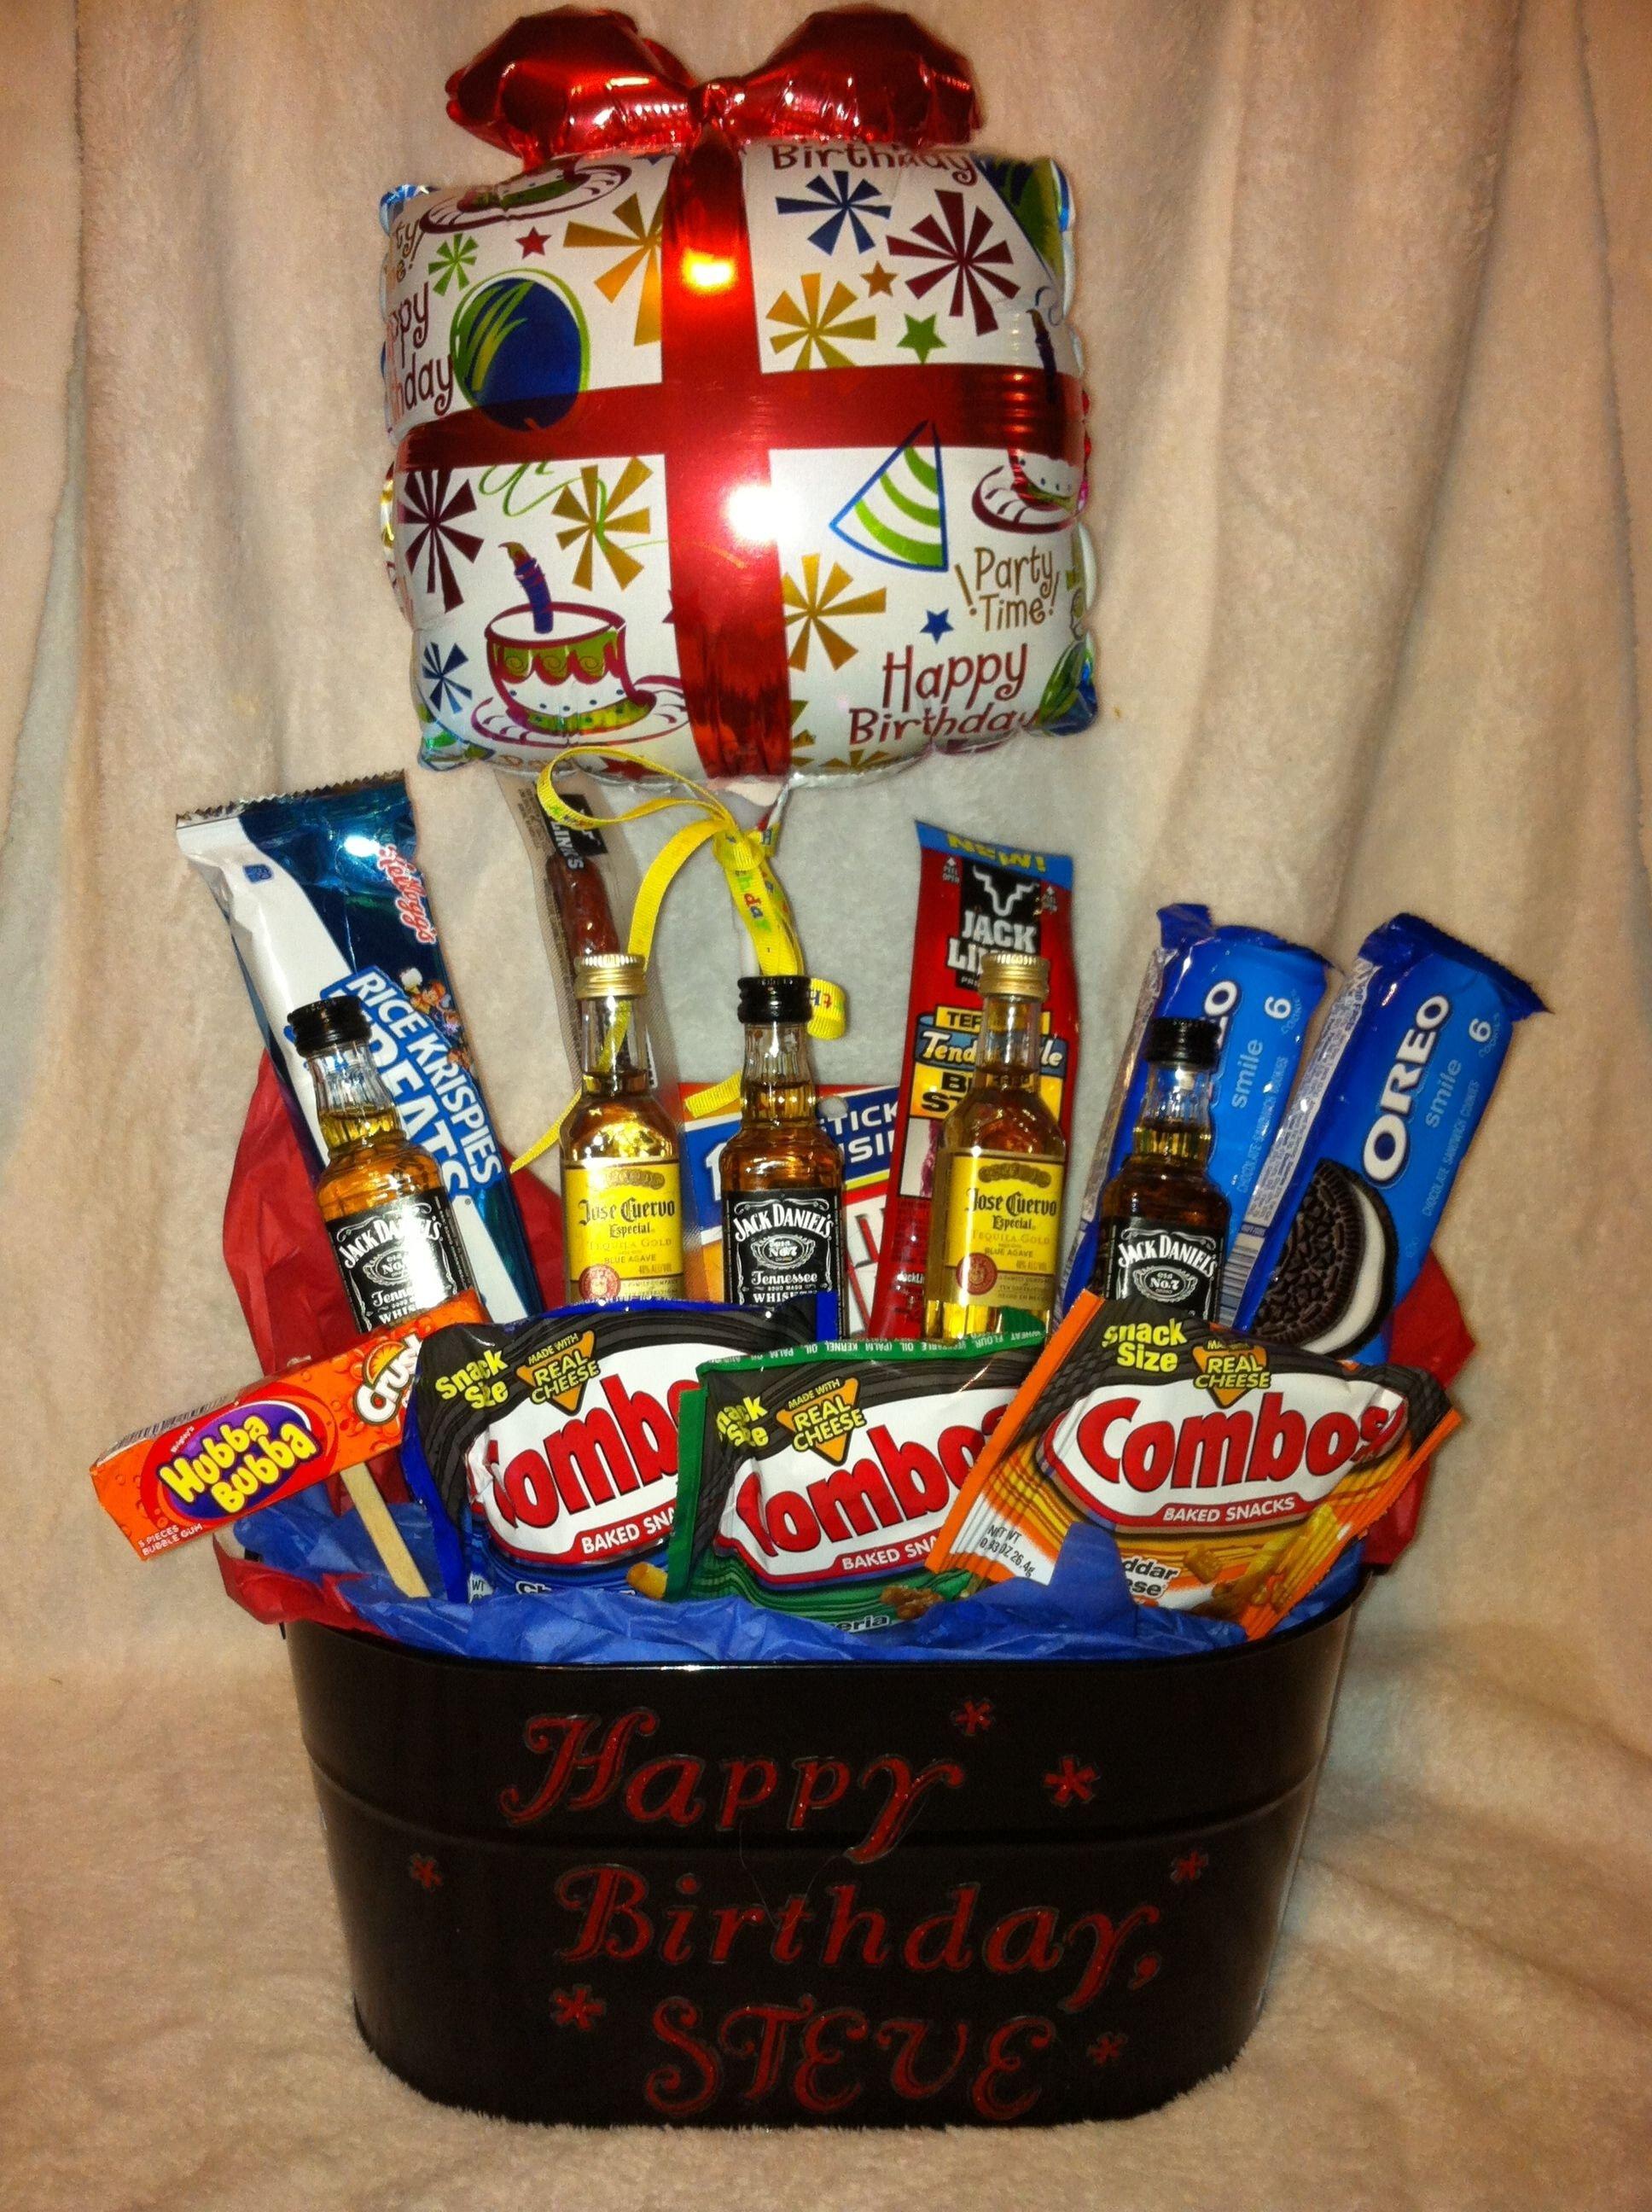 10 Pretty Best Birthday Ideas For Him birthday gift basket for him gift stuff pinterest birthday 2 2020